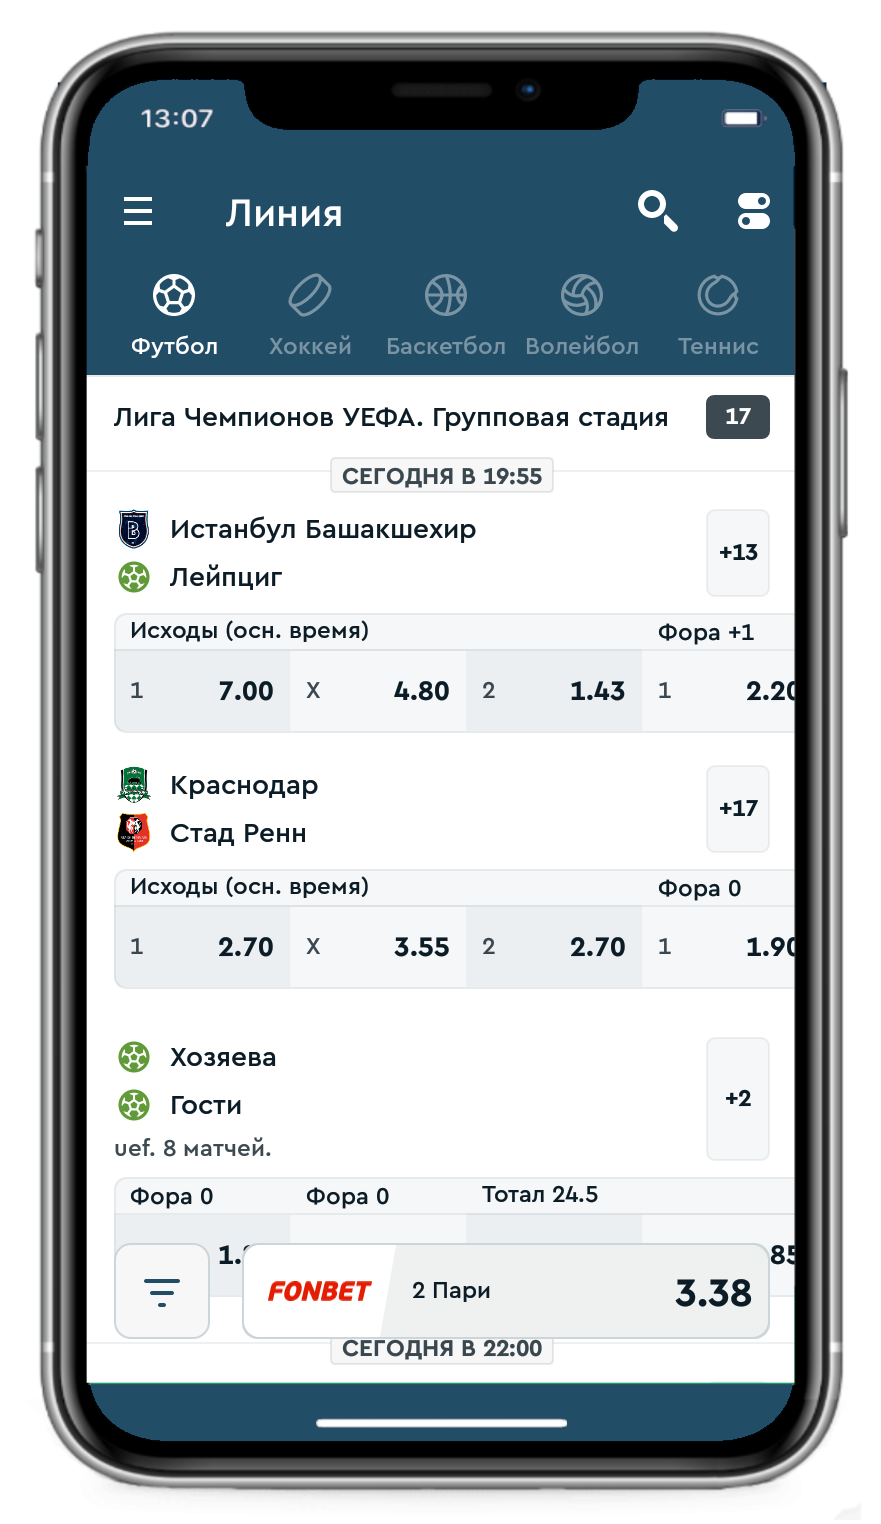 Линия iOS